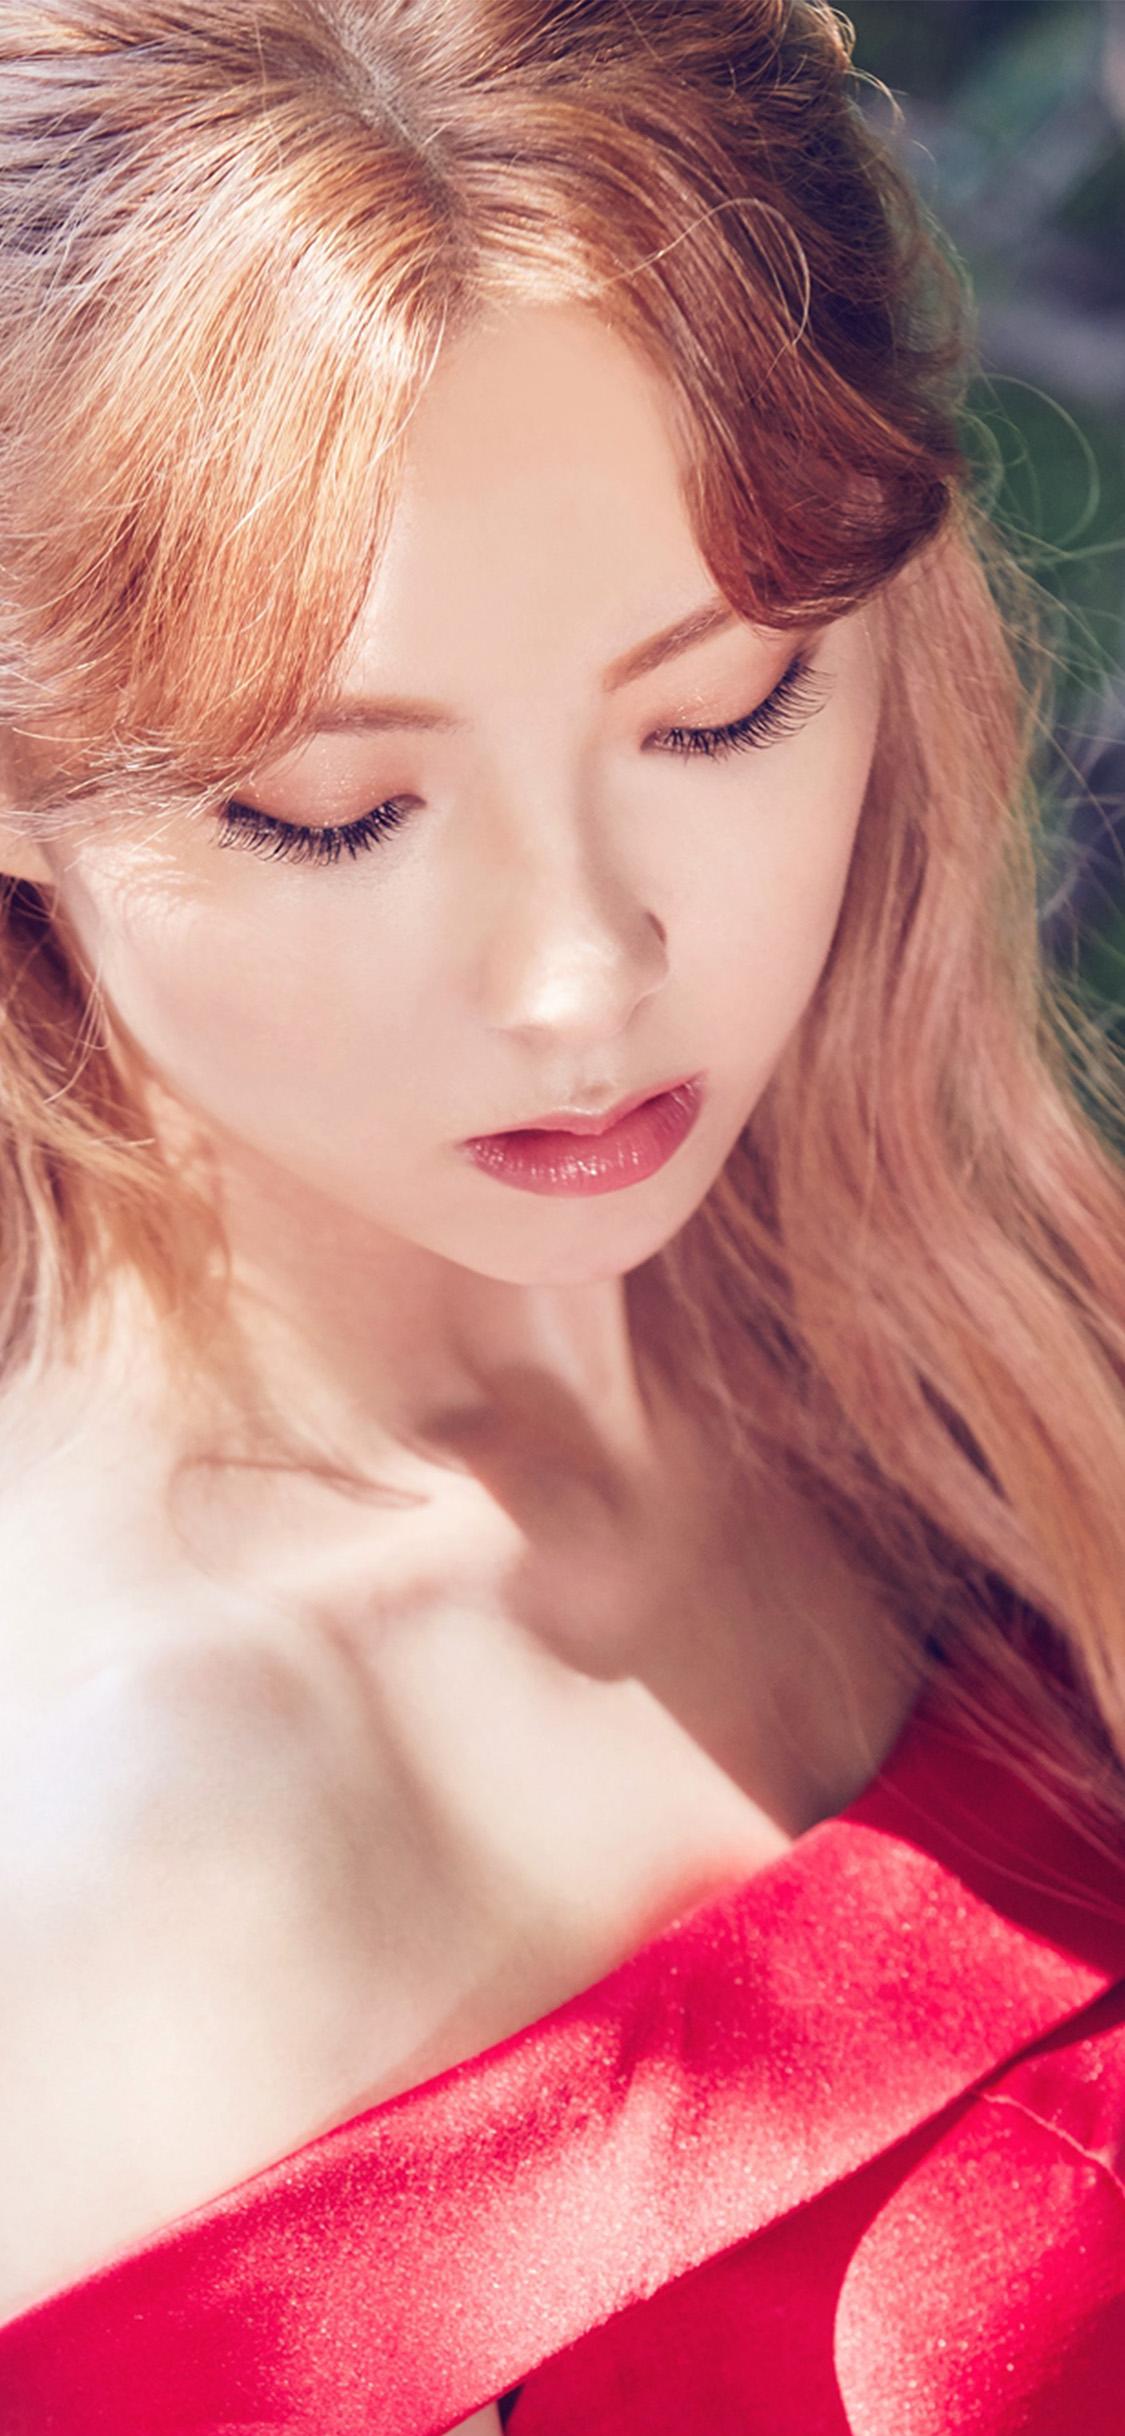 iPhonexpapers.com-Apple-iPhone-wallpaper-ho83-woman-red-dress-kpop-girl